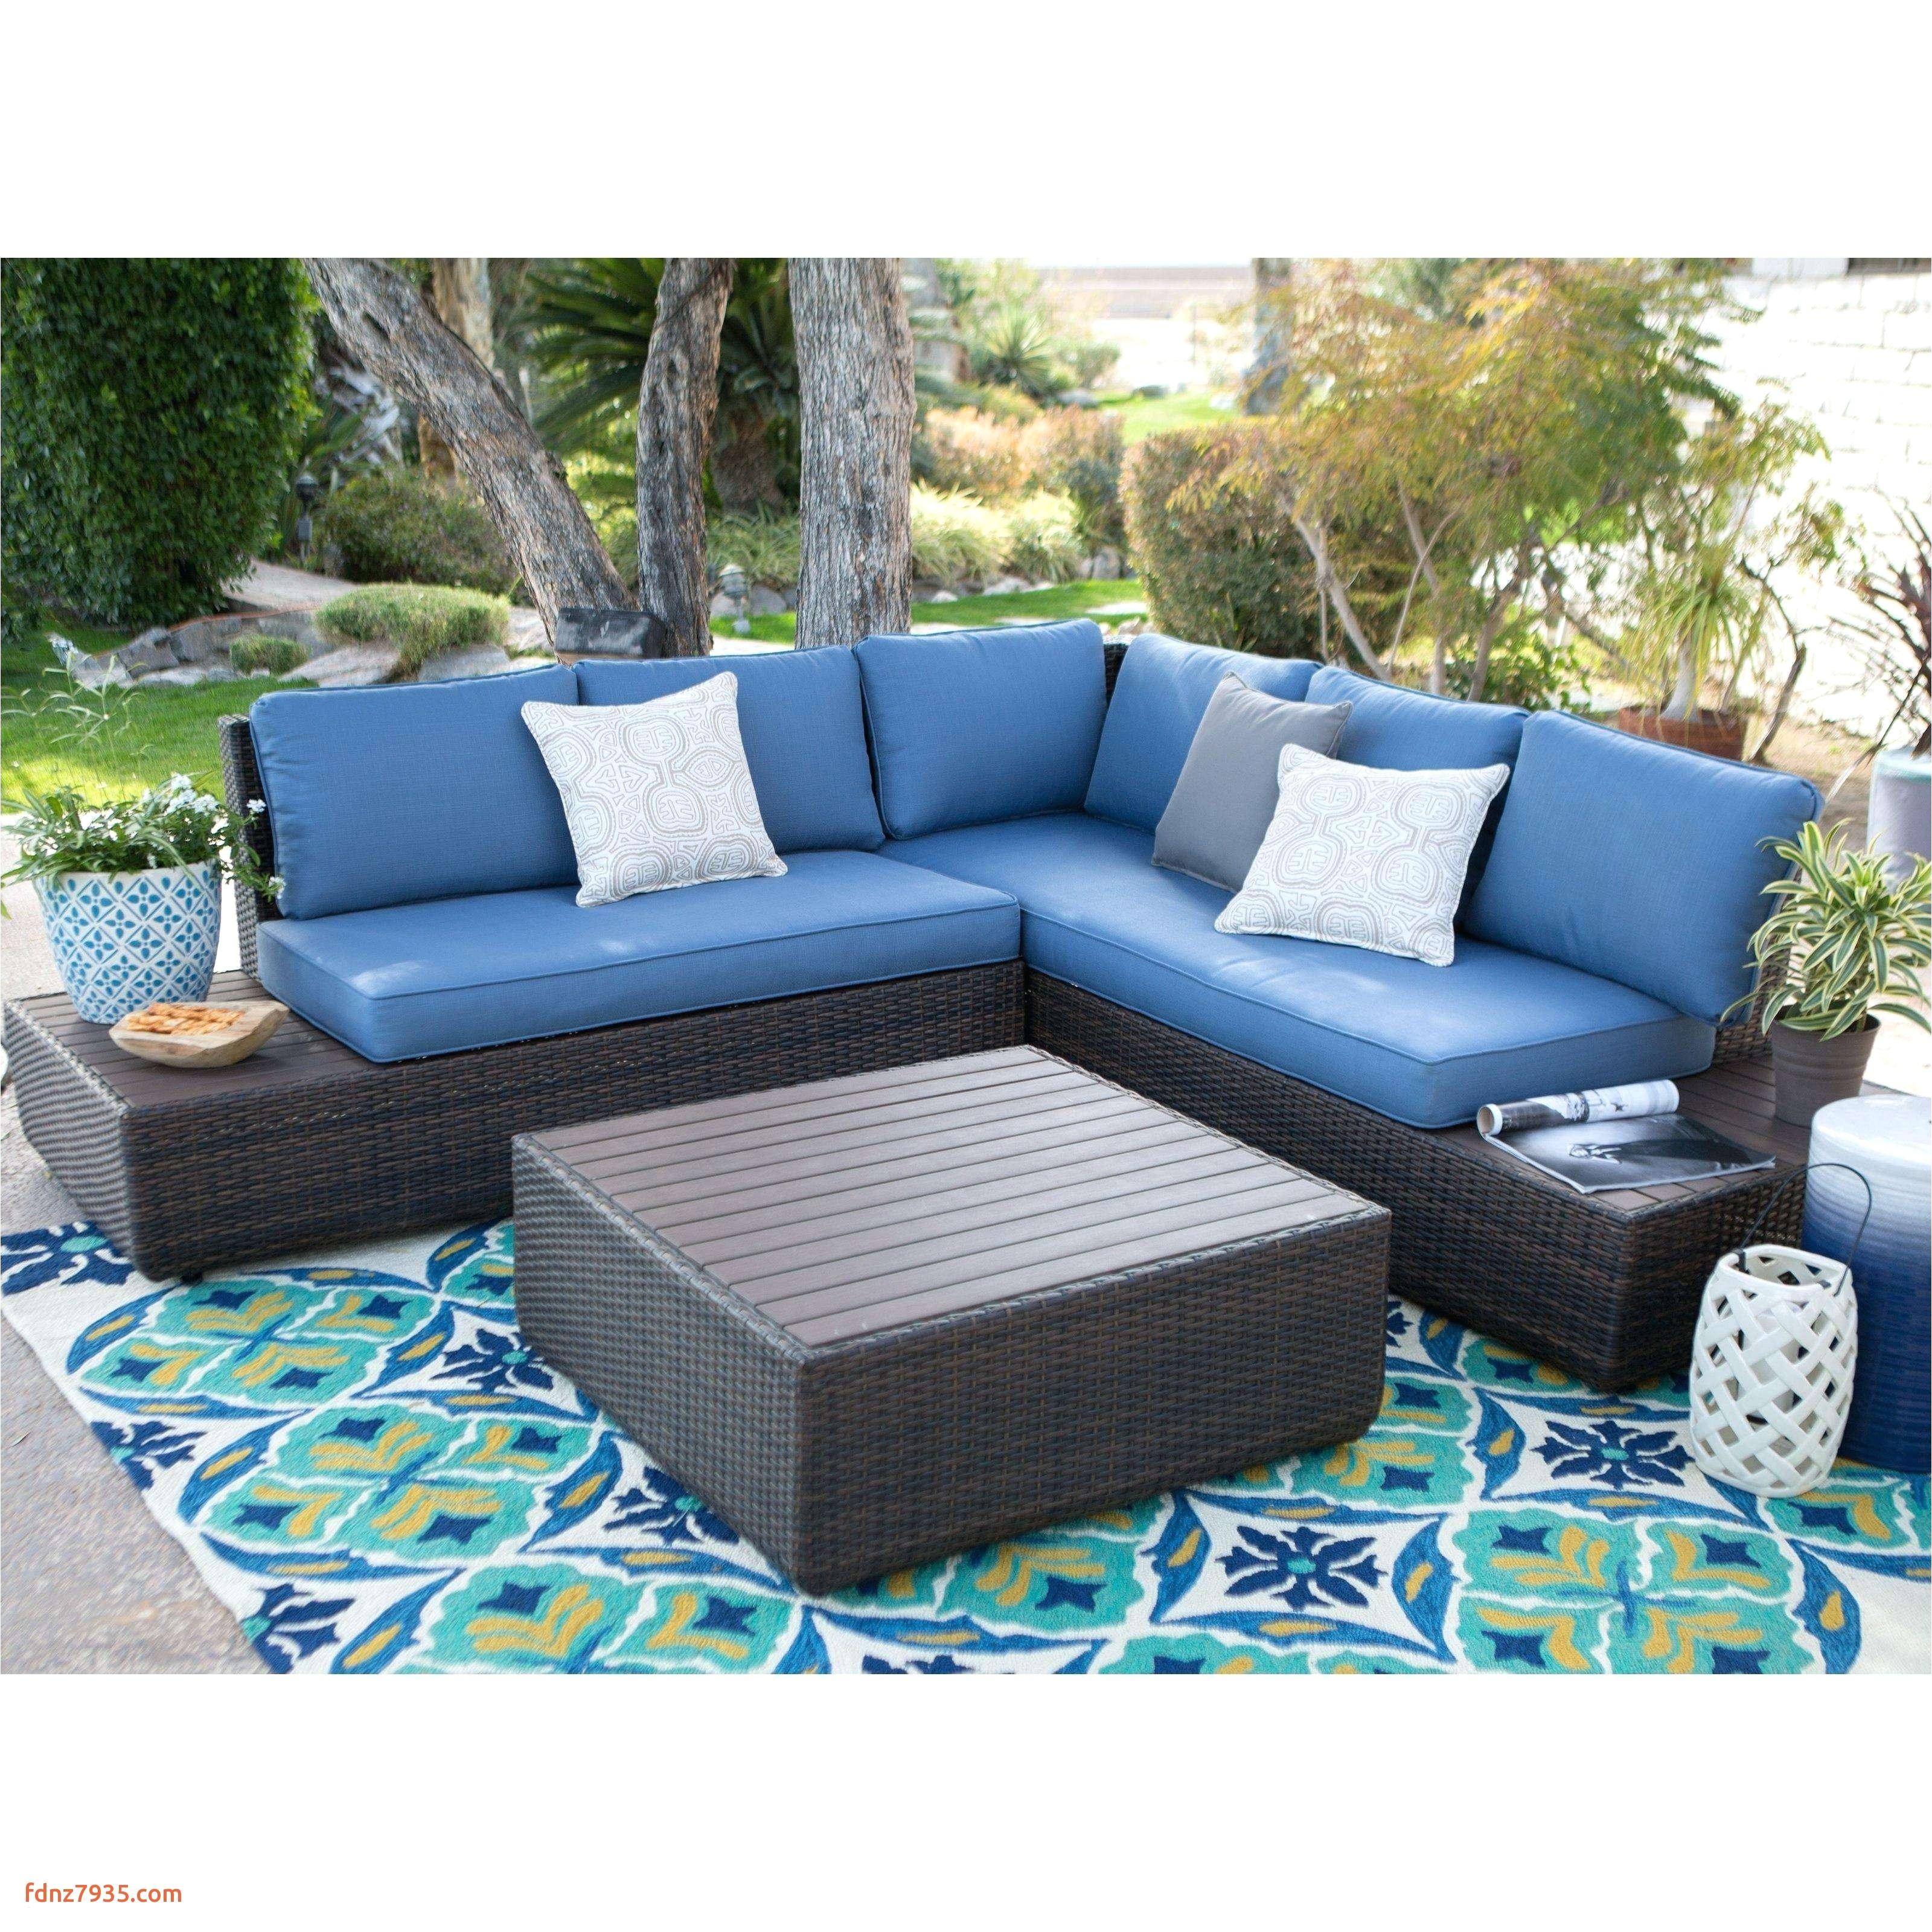 outdoor wood sofa beautiful 2 chair patio set elegant wicker outdoor sofa 0d patio chairs sale